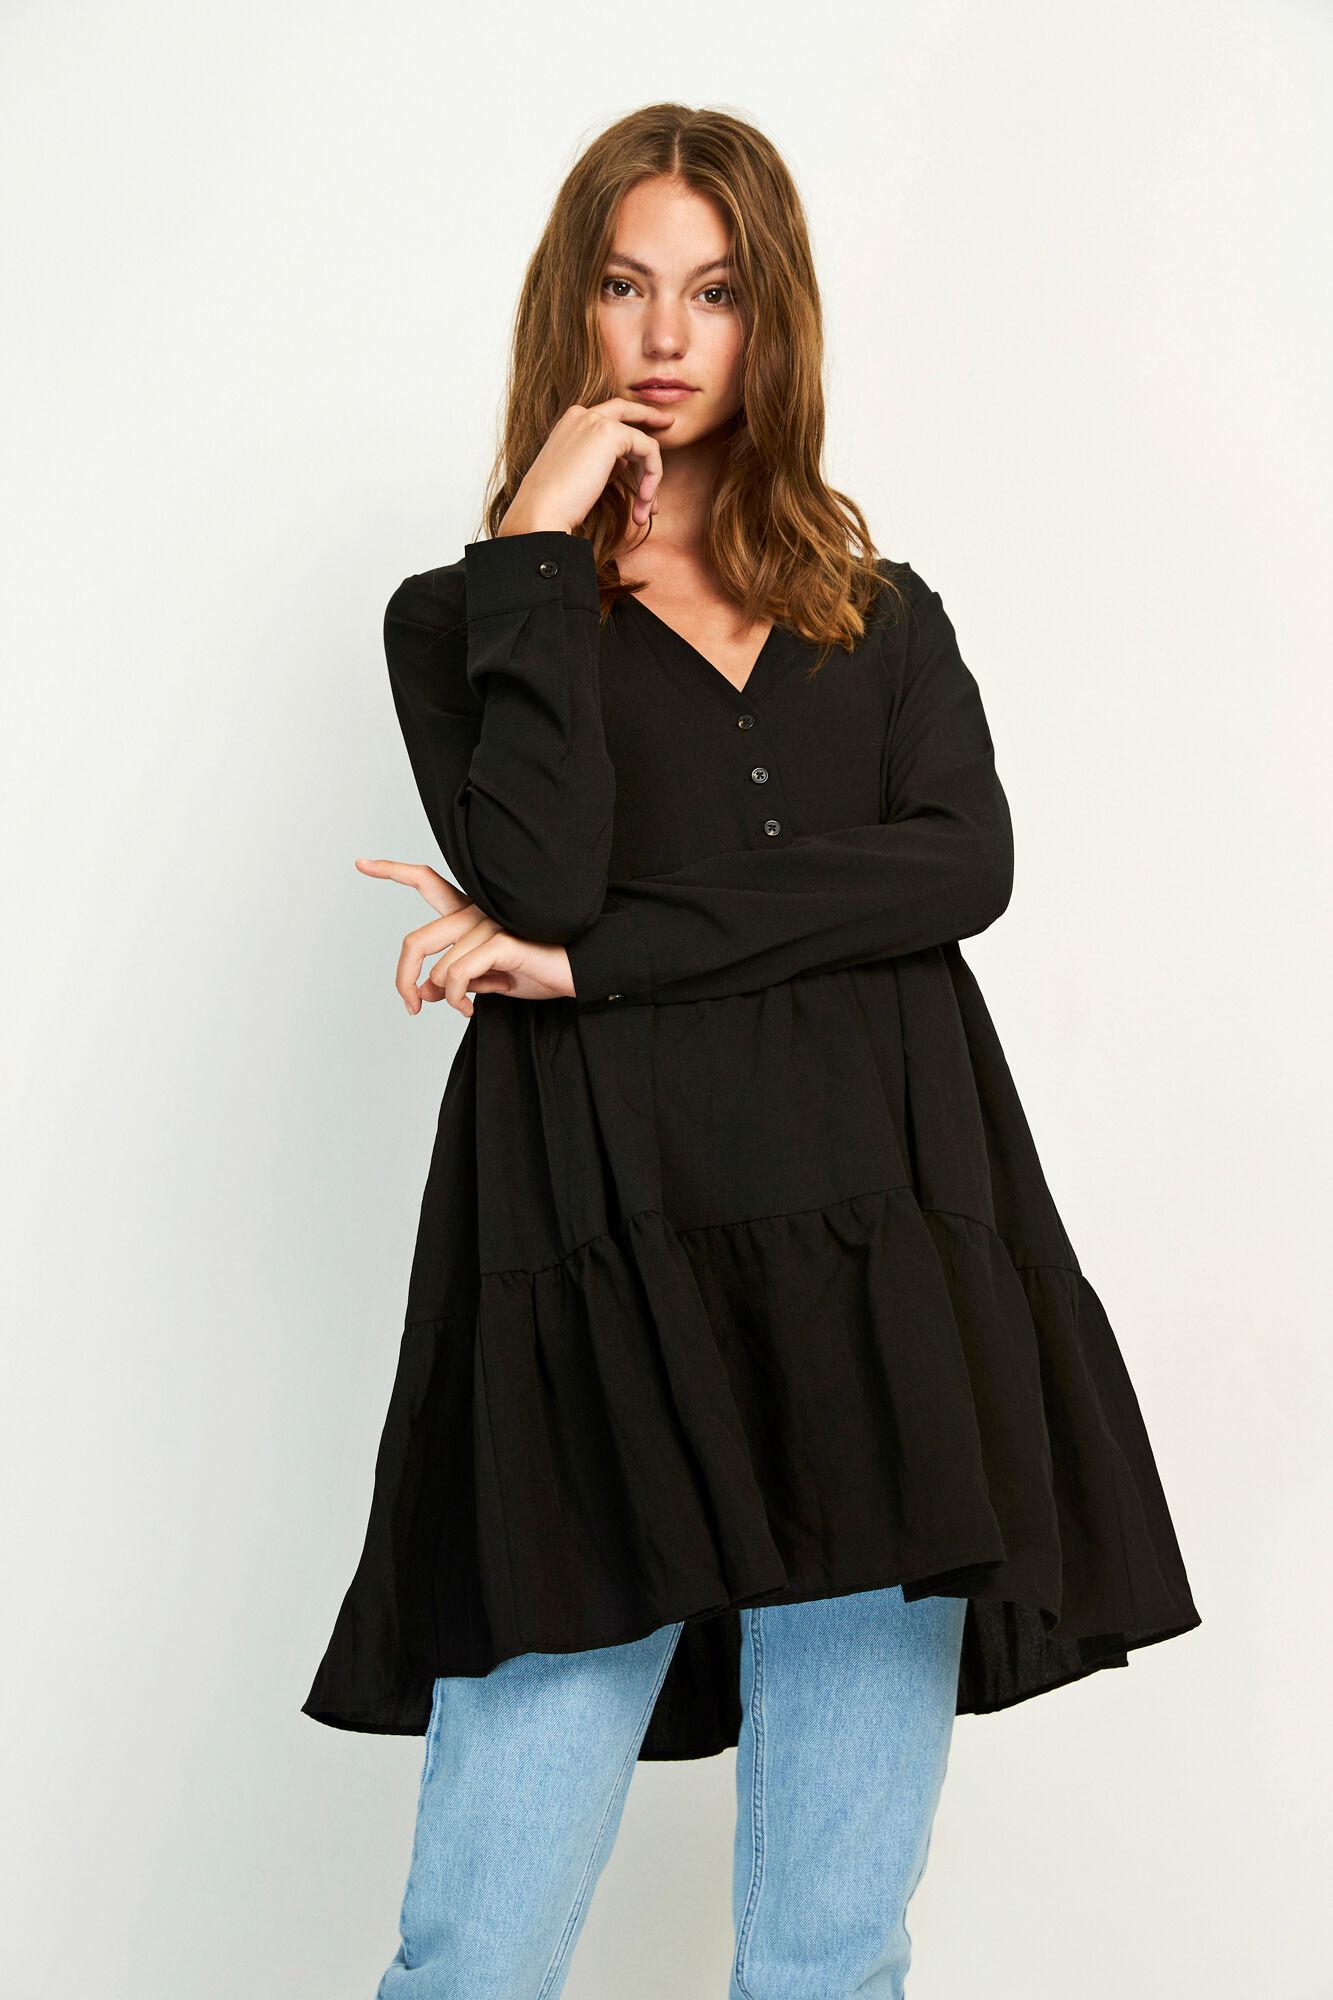 ENTEAK LS V-N DRESS 6660